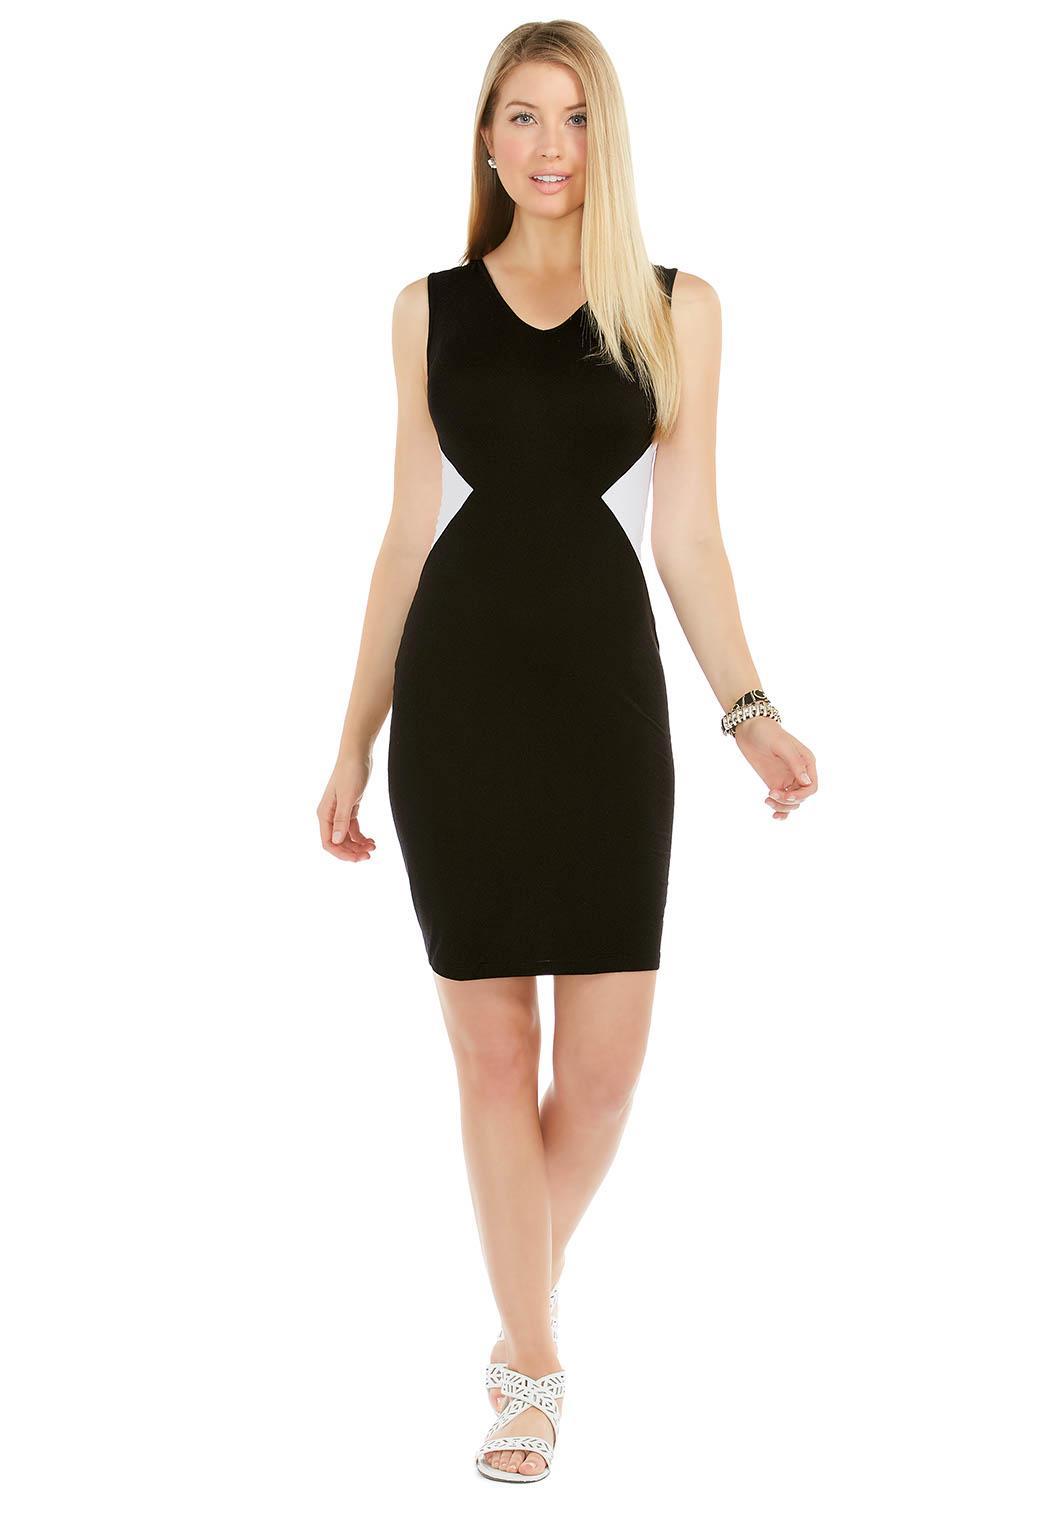 6141 901 l Catos Fashion